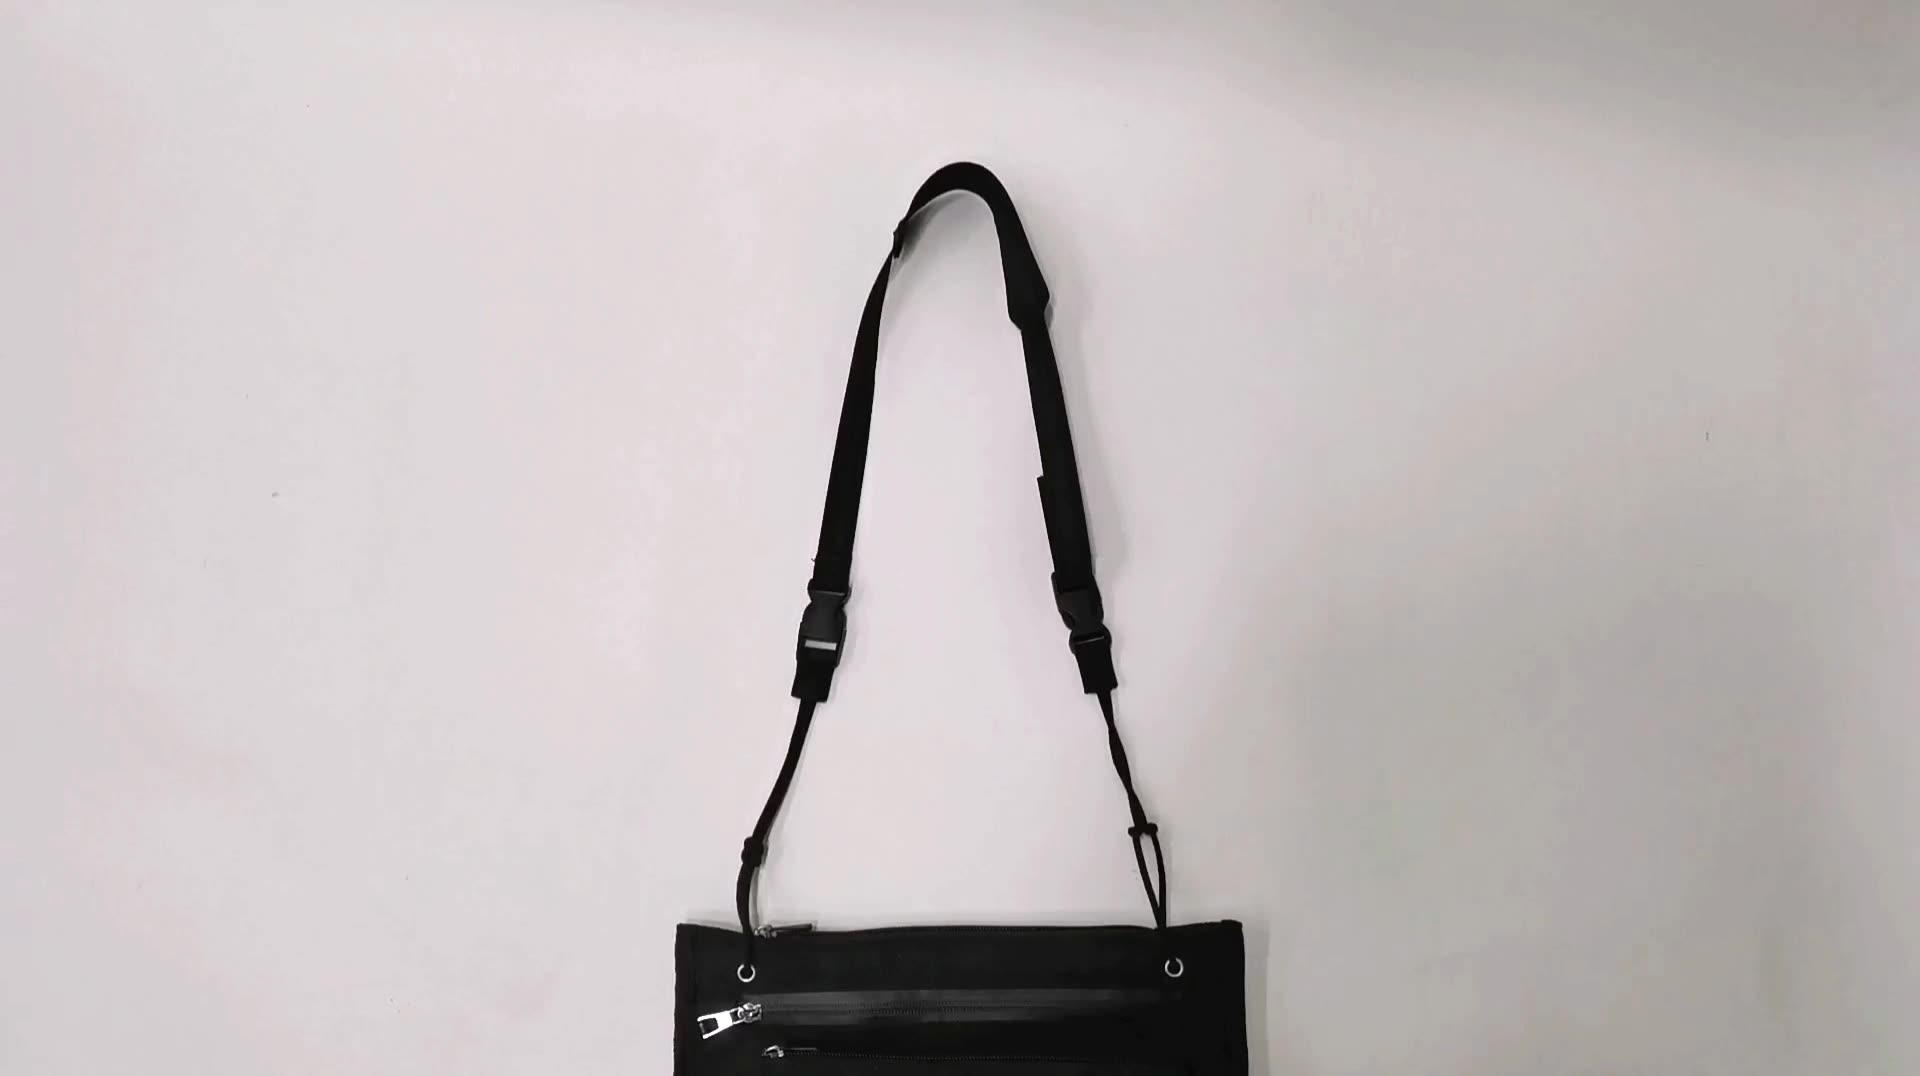 Hot sale Fashion Durable Unisex High quality waterproof zipper Adjustable Strap Hip Hop 600D Oxford Tote Crossbody Messenger Bag